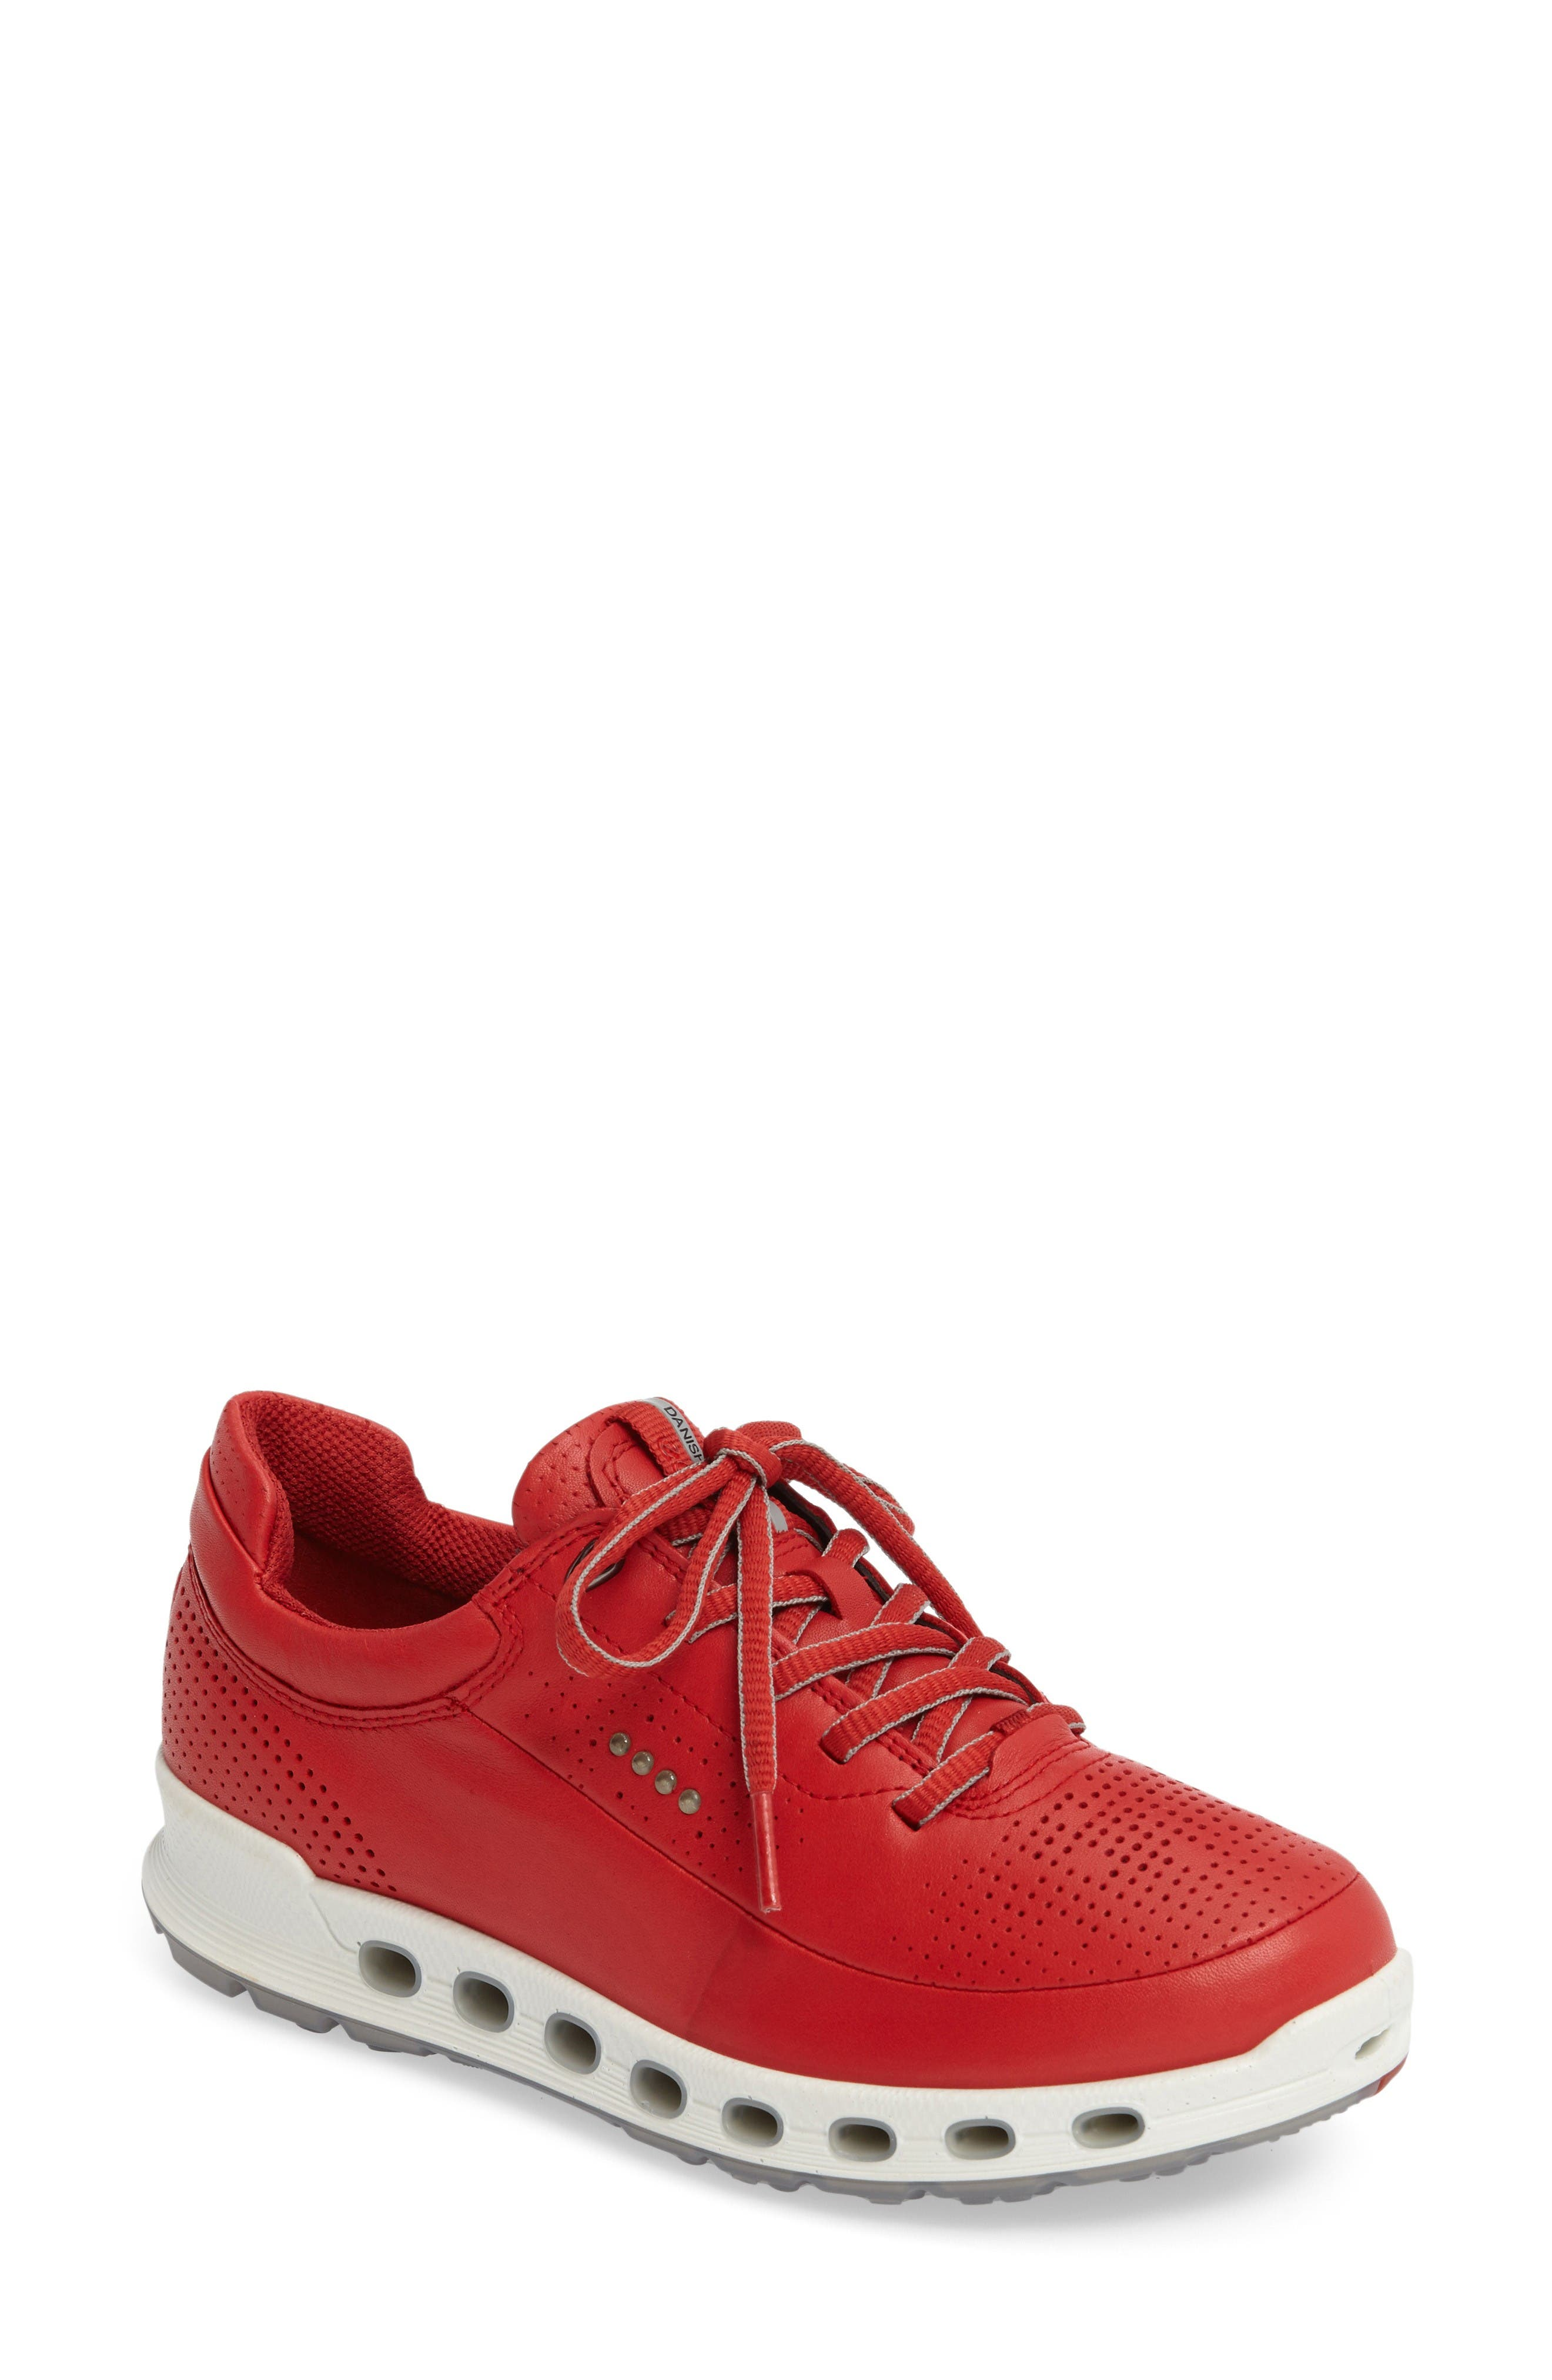 ECCO Cool 2.0 GTX Waterproof Sneaker (Women)